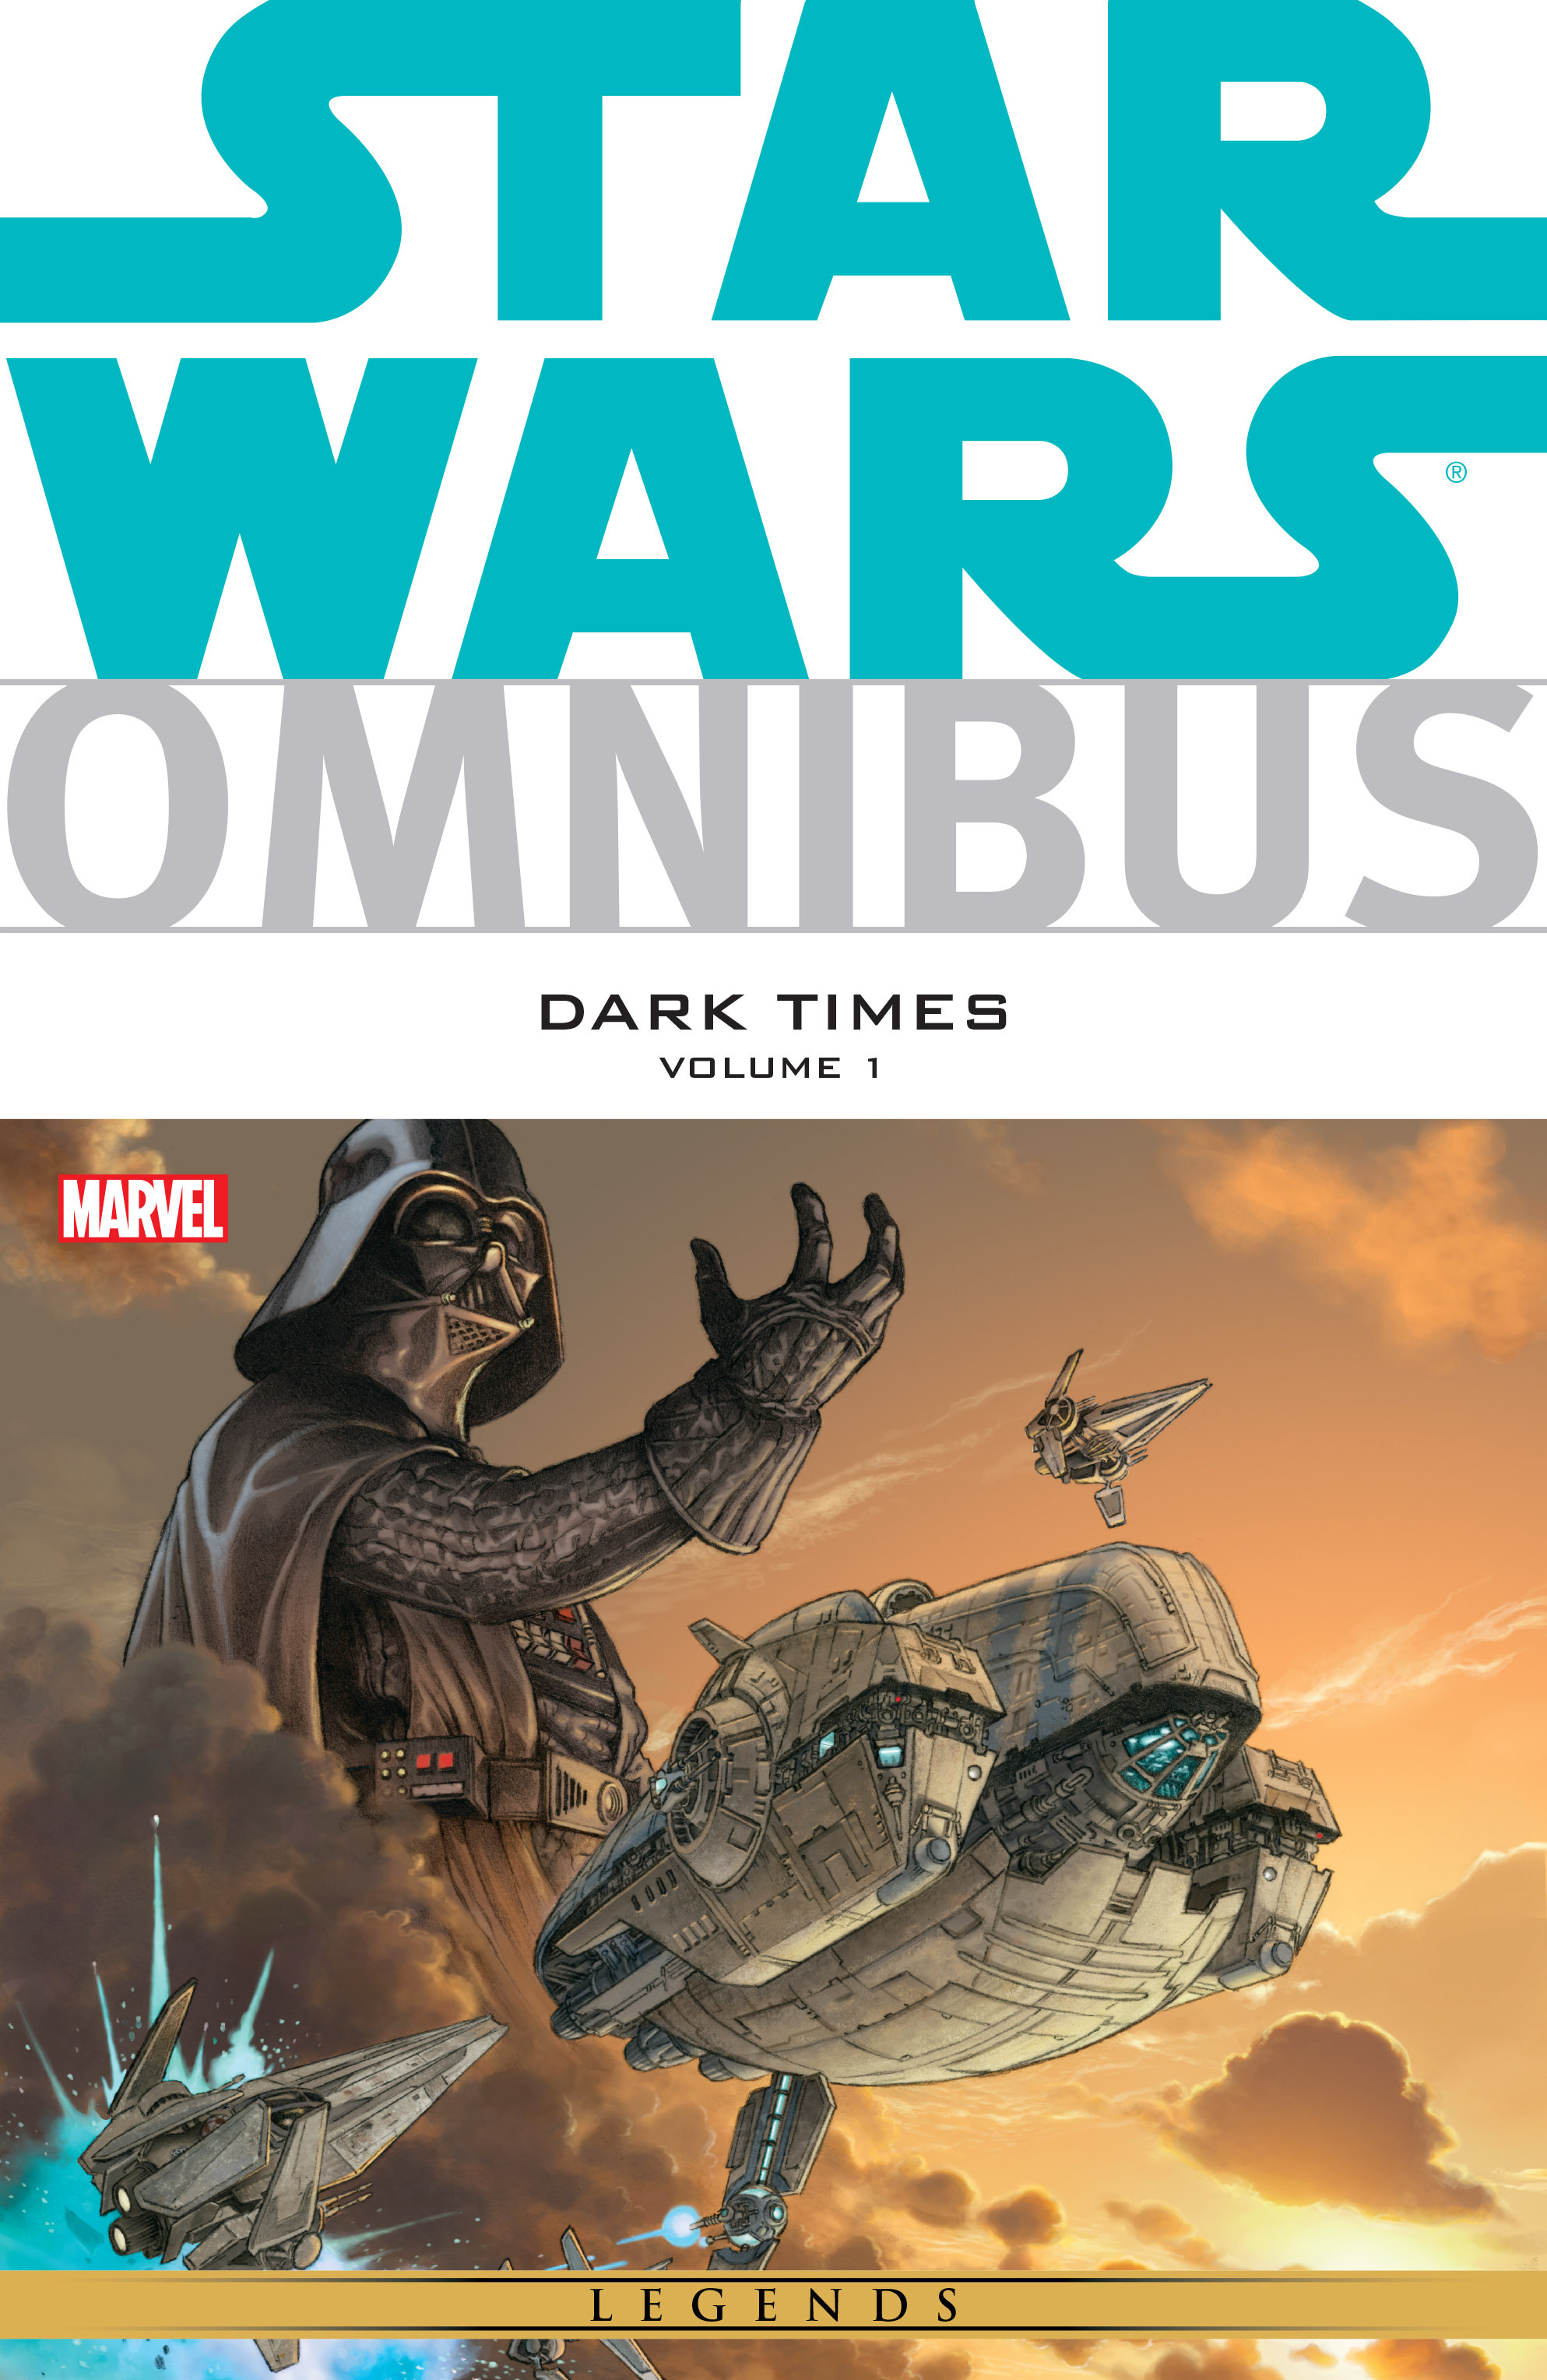 Read online Star Wars Omnibus comic -  Issue # Vol. 31 - 1